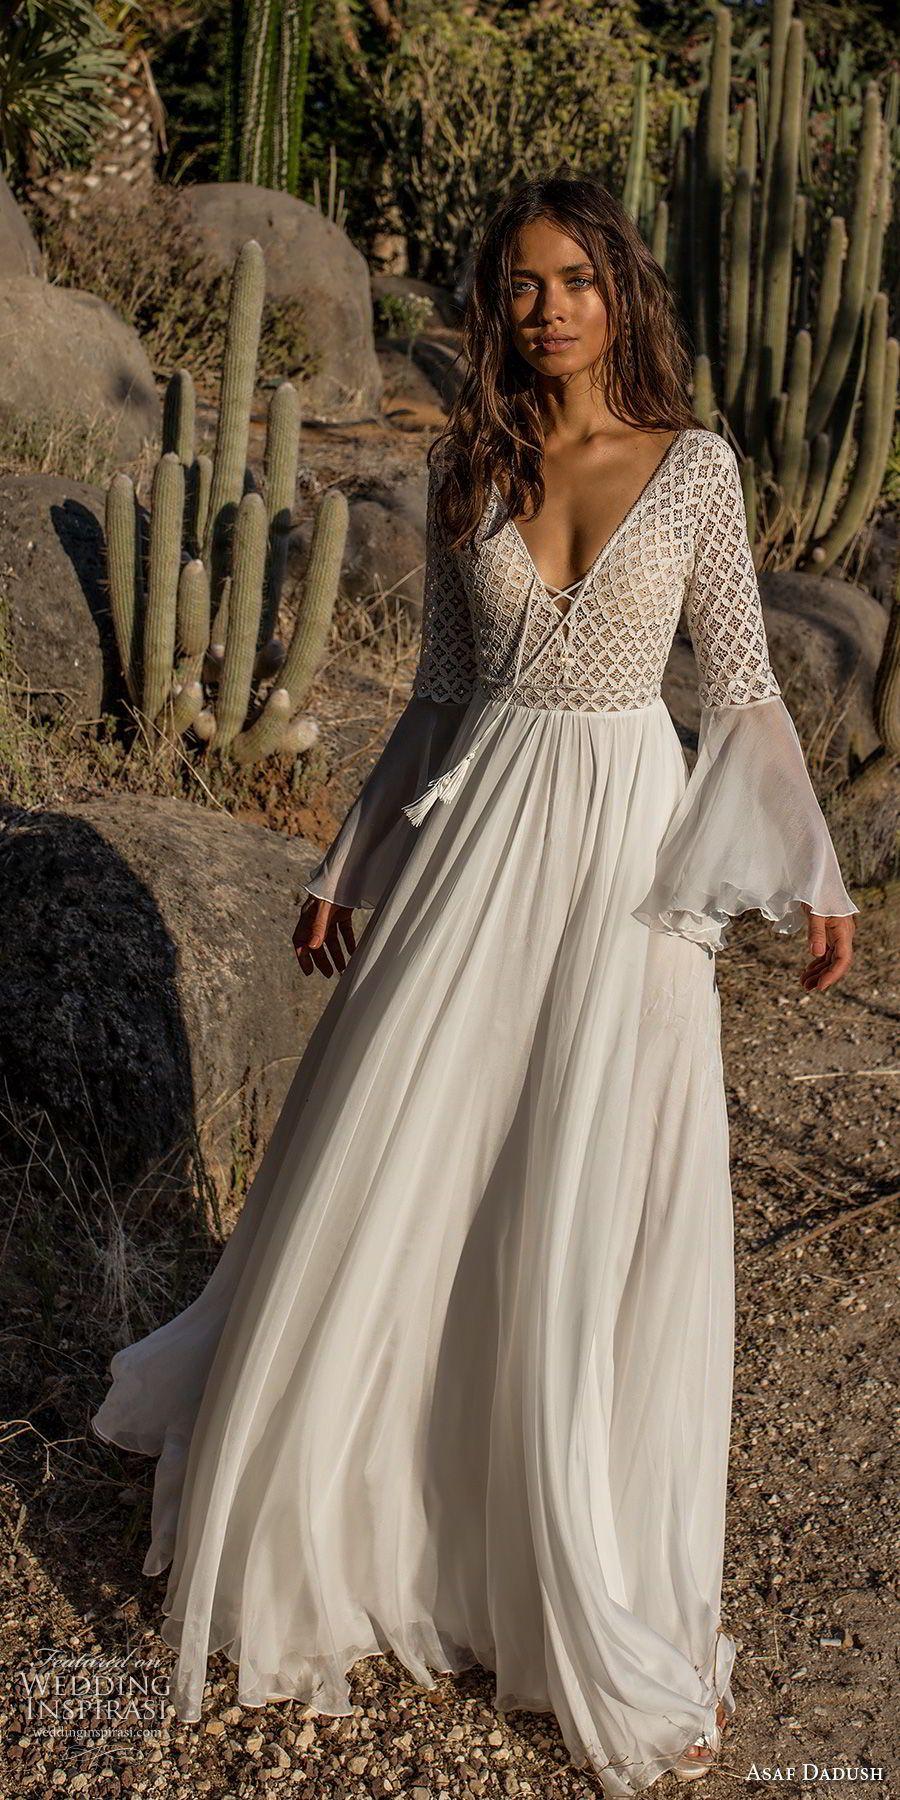 Asaf dadush wedding dresses bodice neckline and bohemian